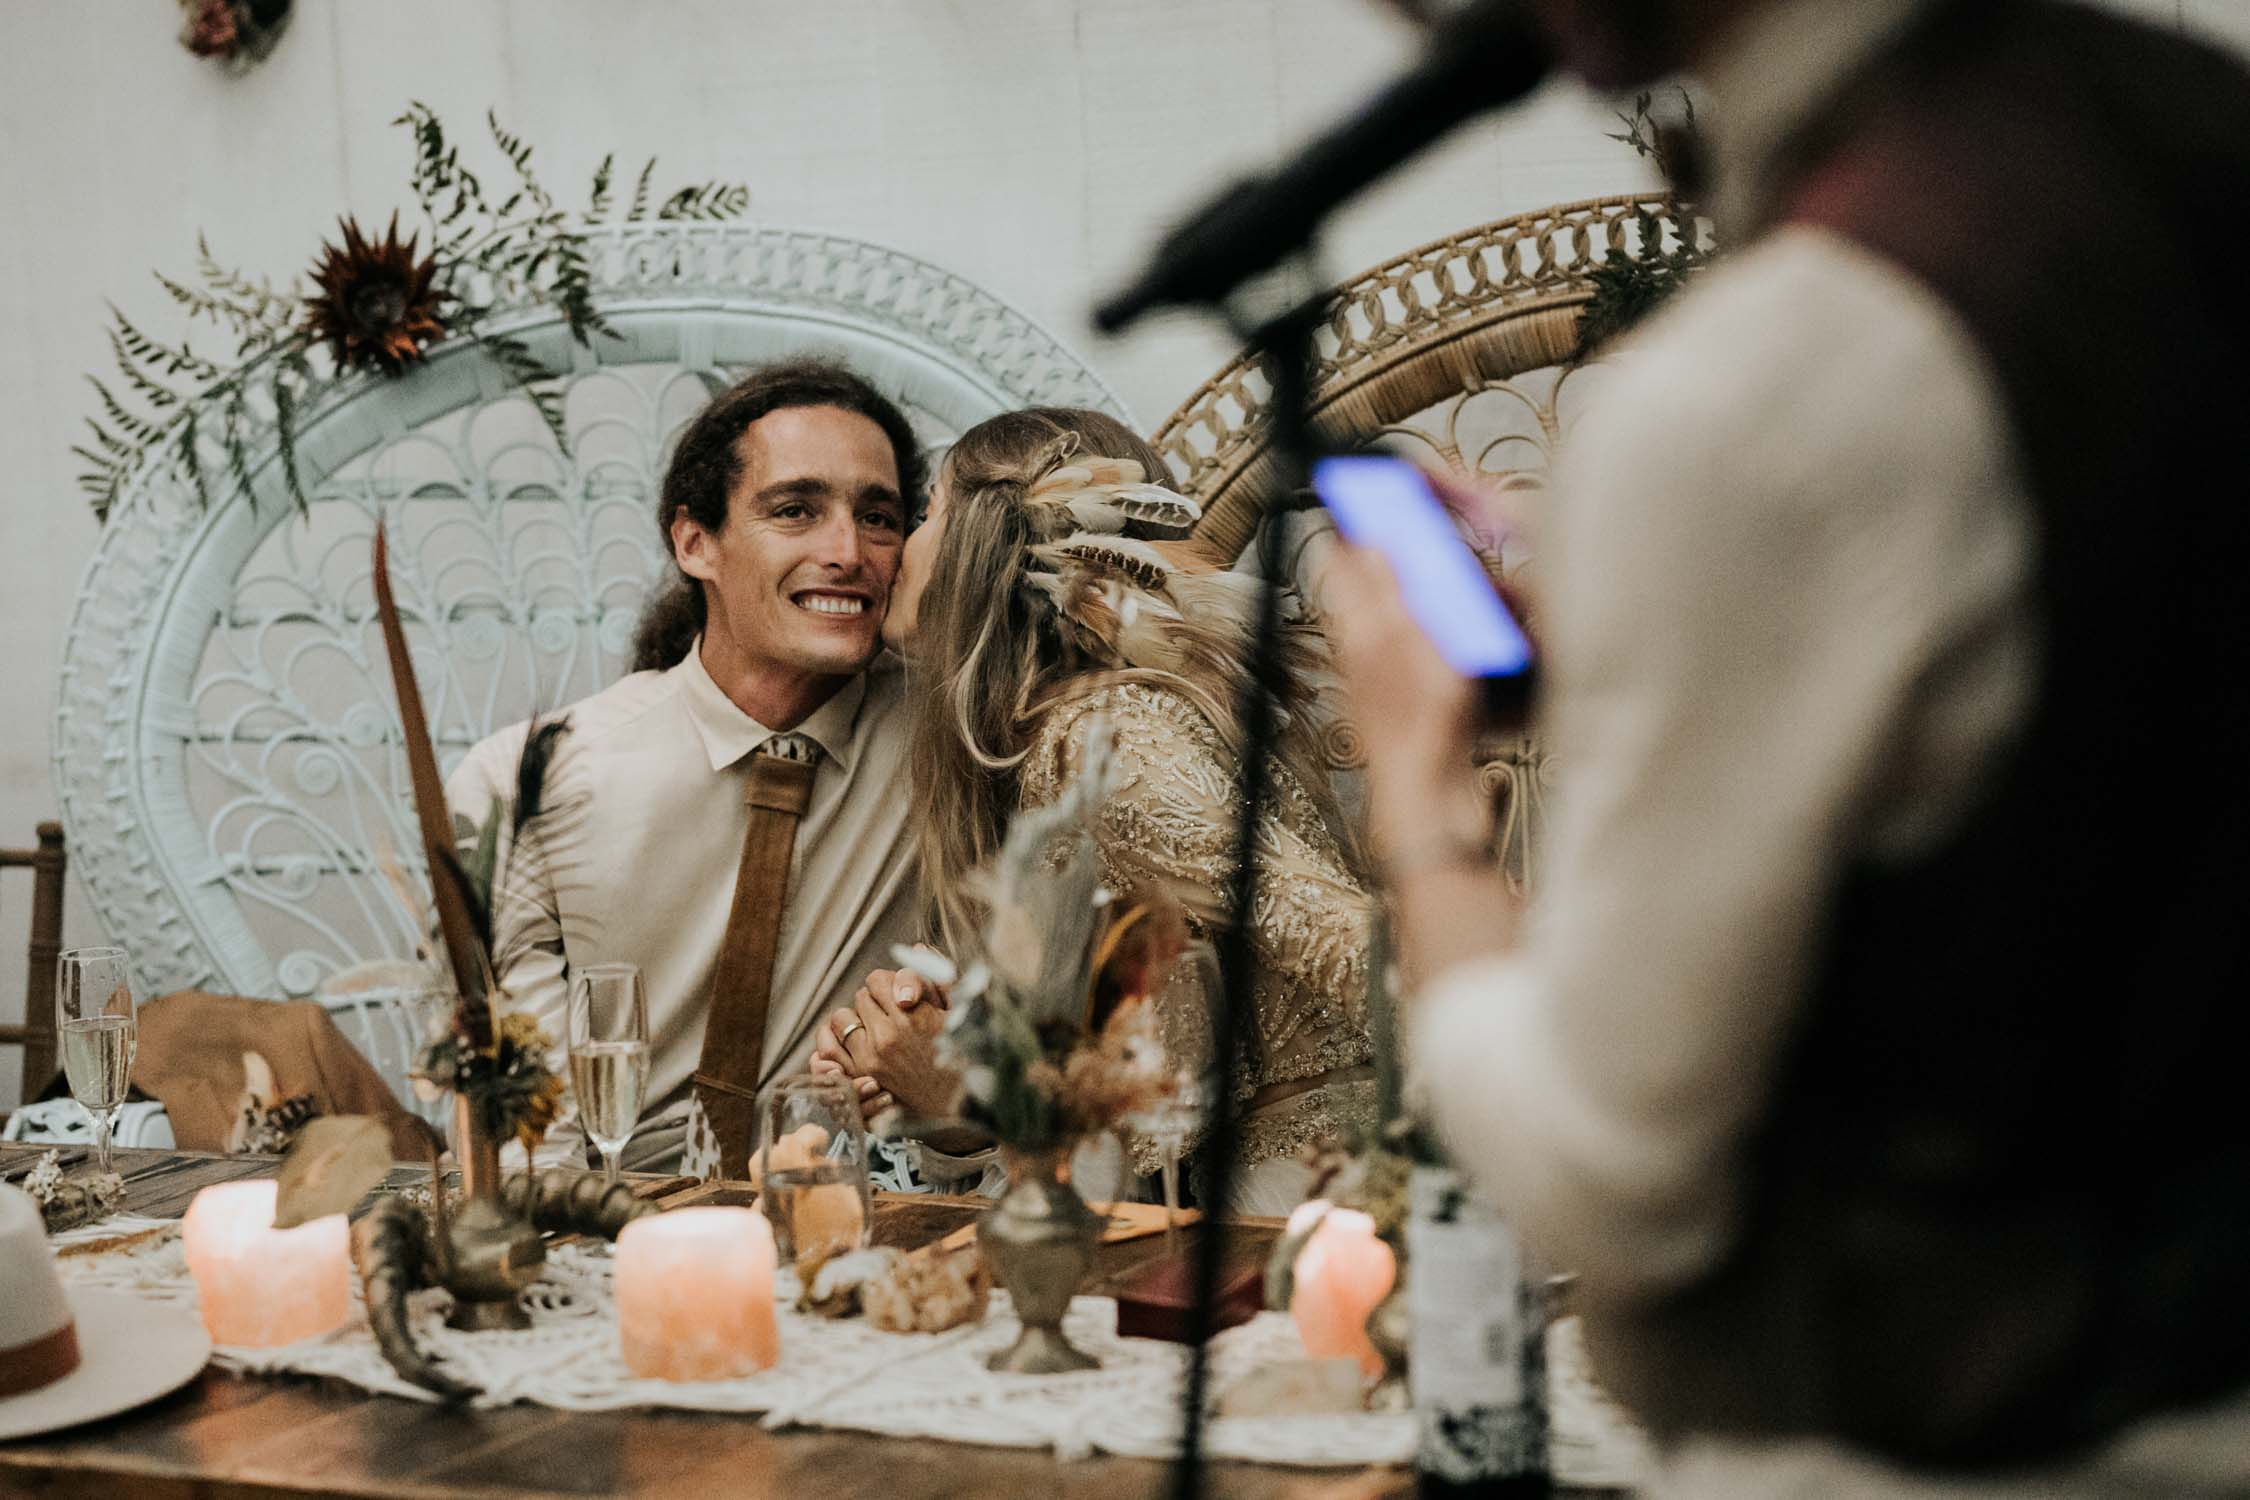 Bride kisses groom on cheek sitting in Bali Boho Wicker Peacock Chairs during wedding speech